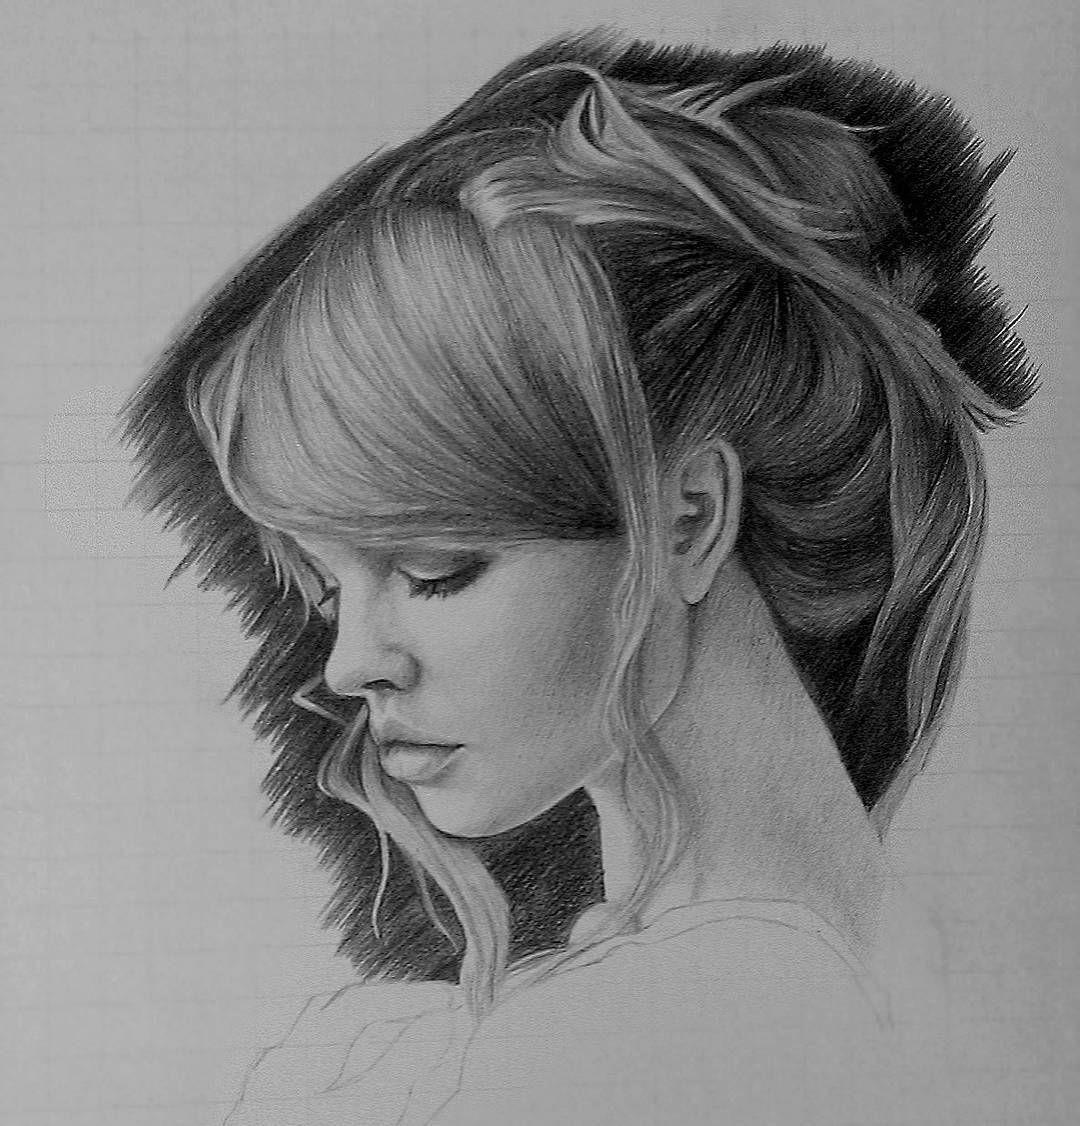 Simple face drawing drawingsdrawings ideasdrawings easydrawings people drawings tumblrdrawings of peopledrawings ideas pencil drawings drawingtips